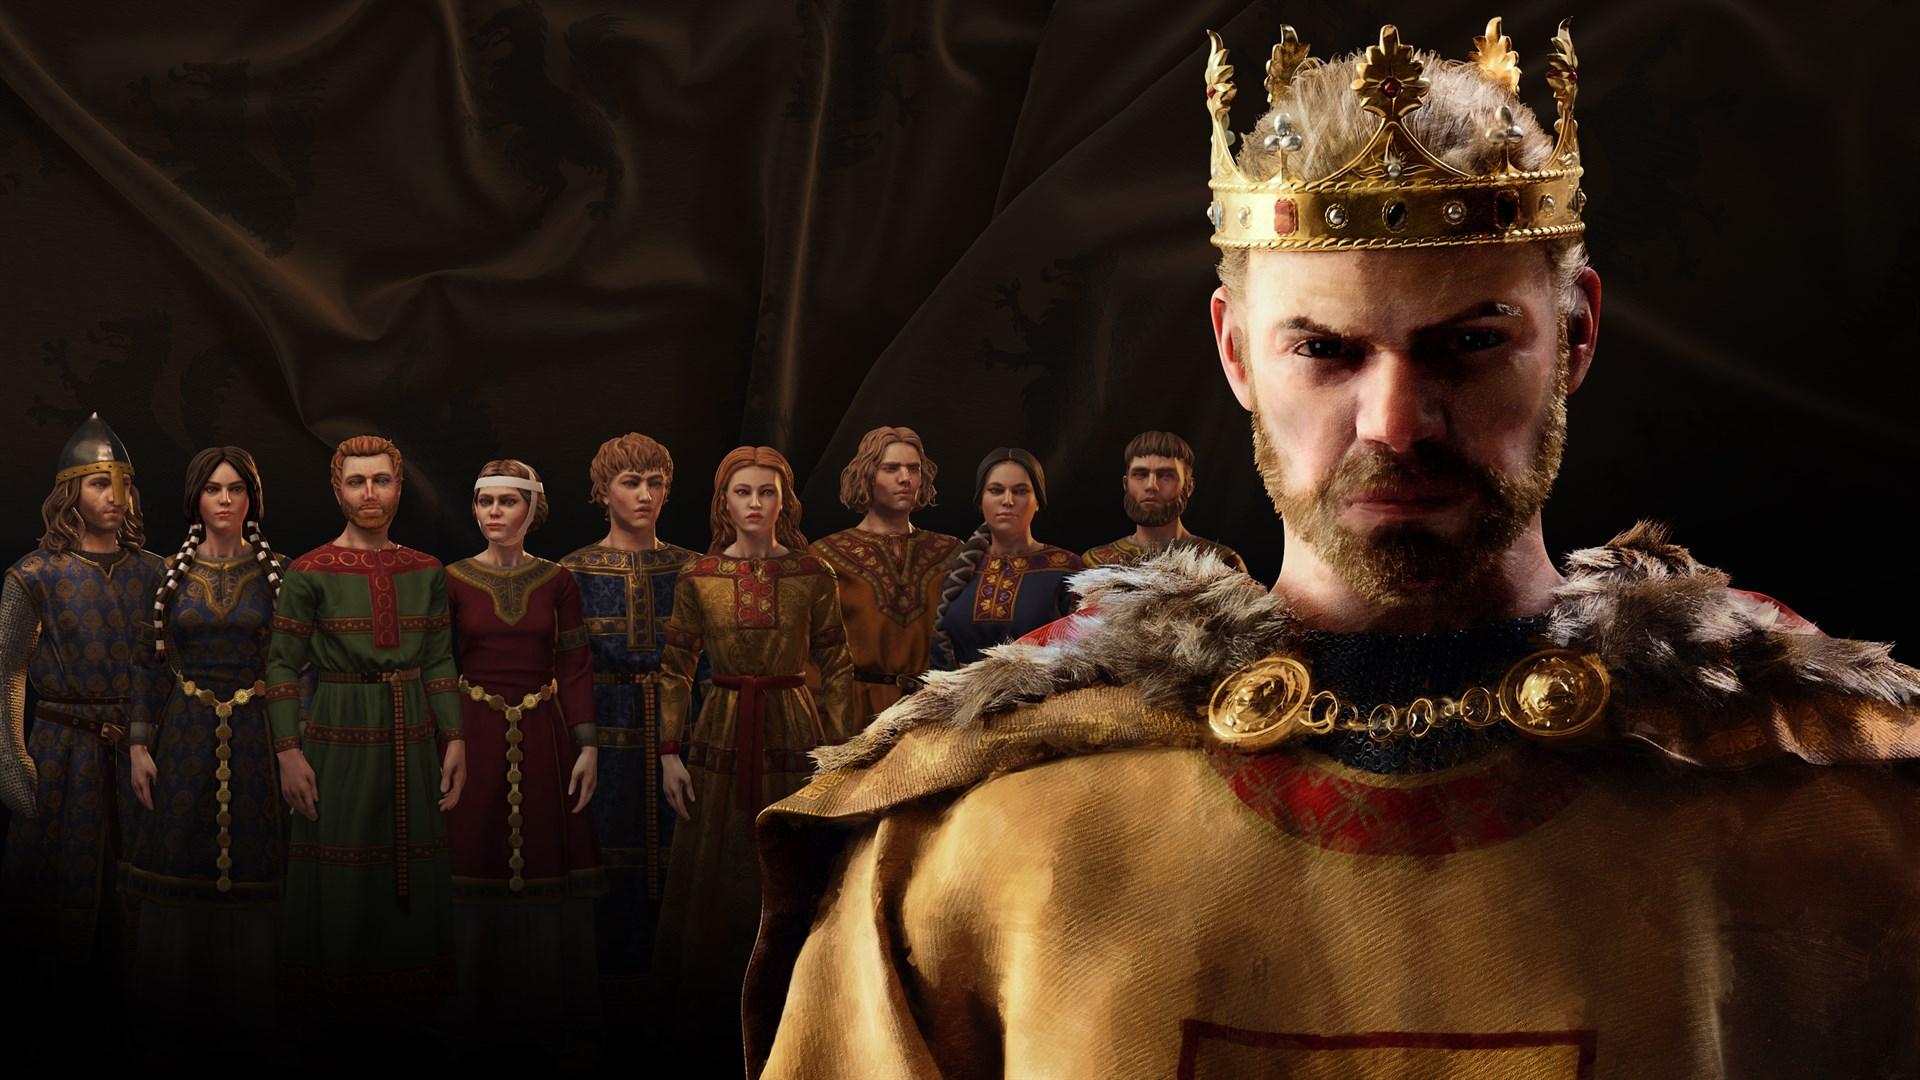 Crusader Kings III: Garments of the Holy Roman Empire